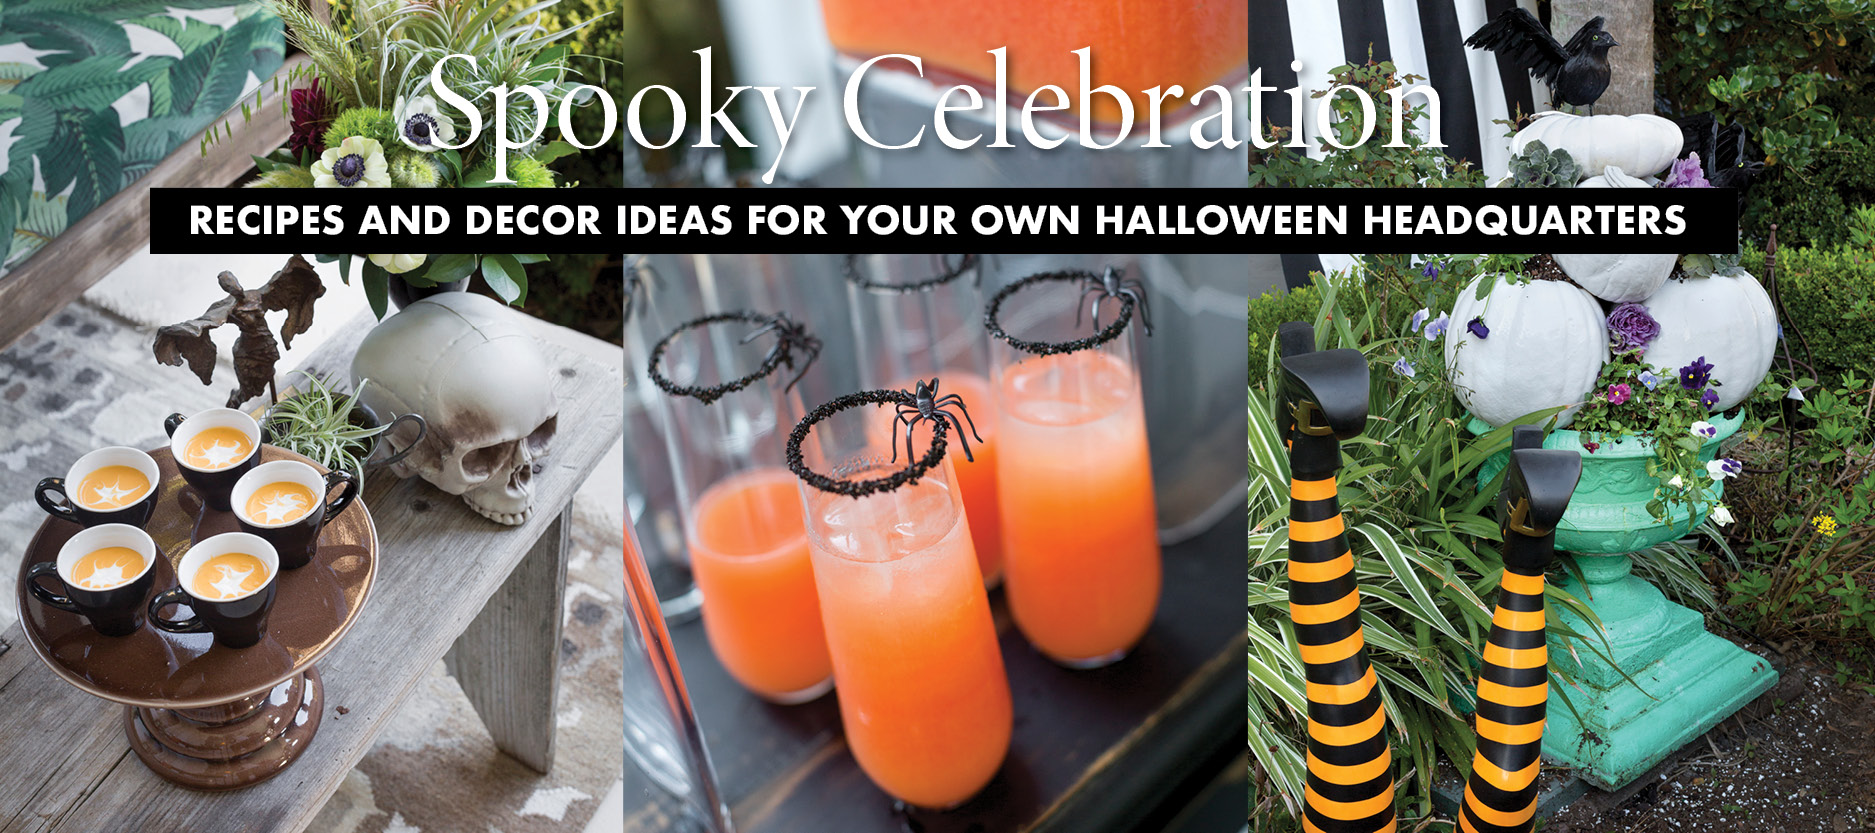 Halloween Headquarters Recipes & Decor